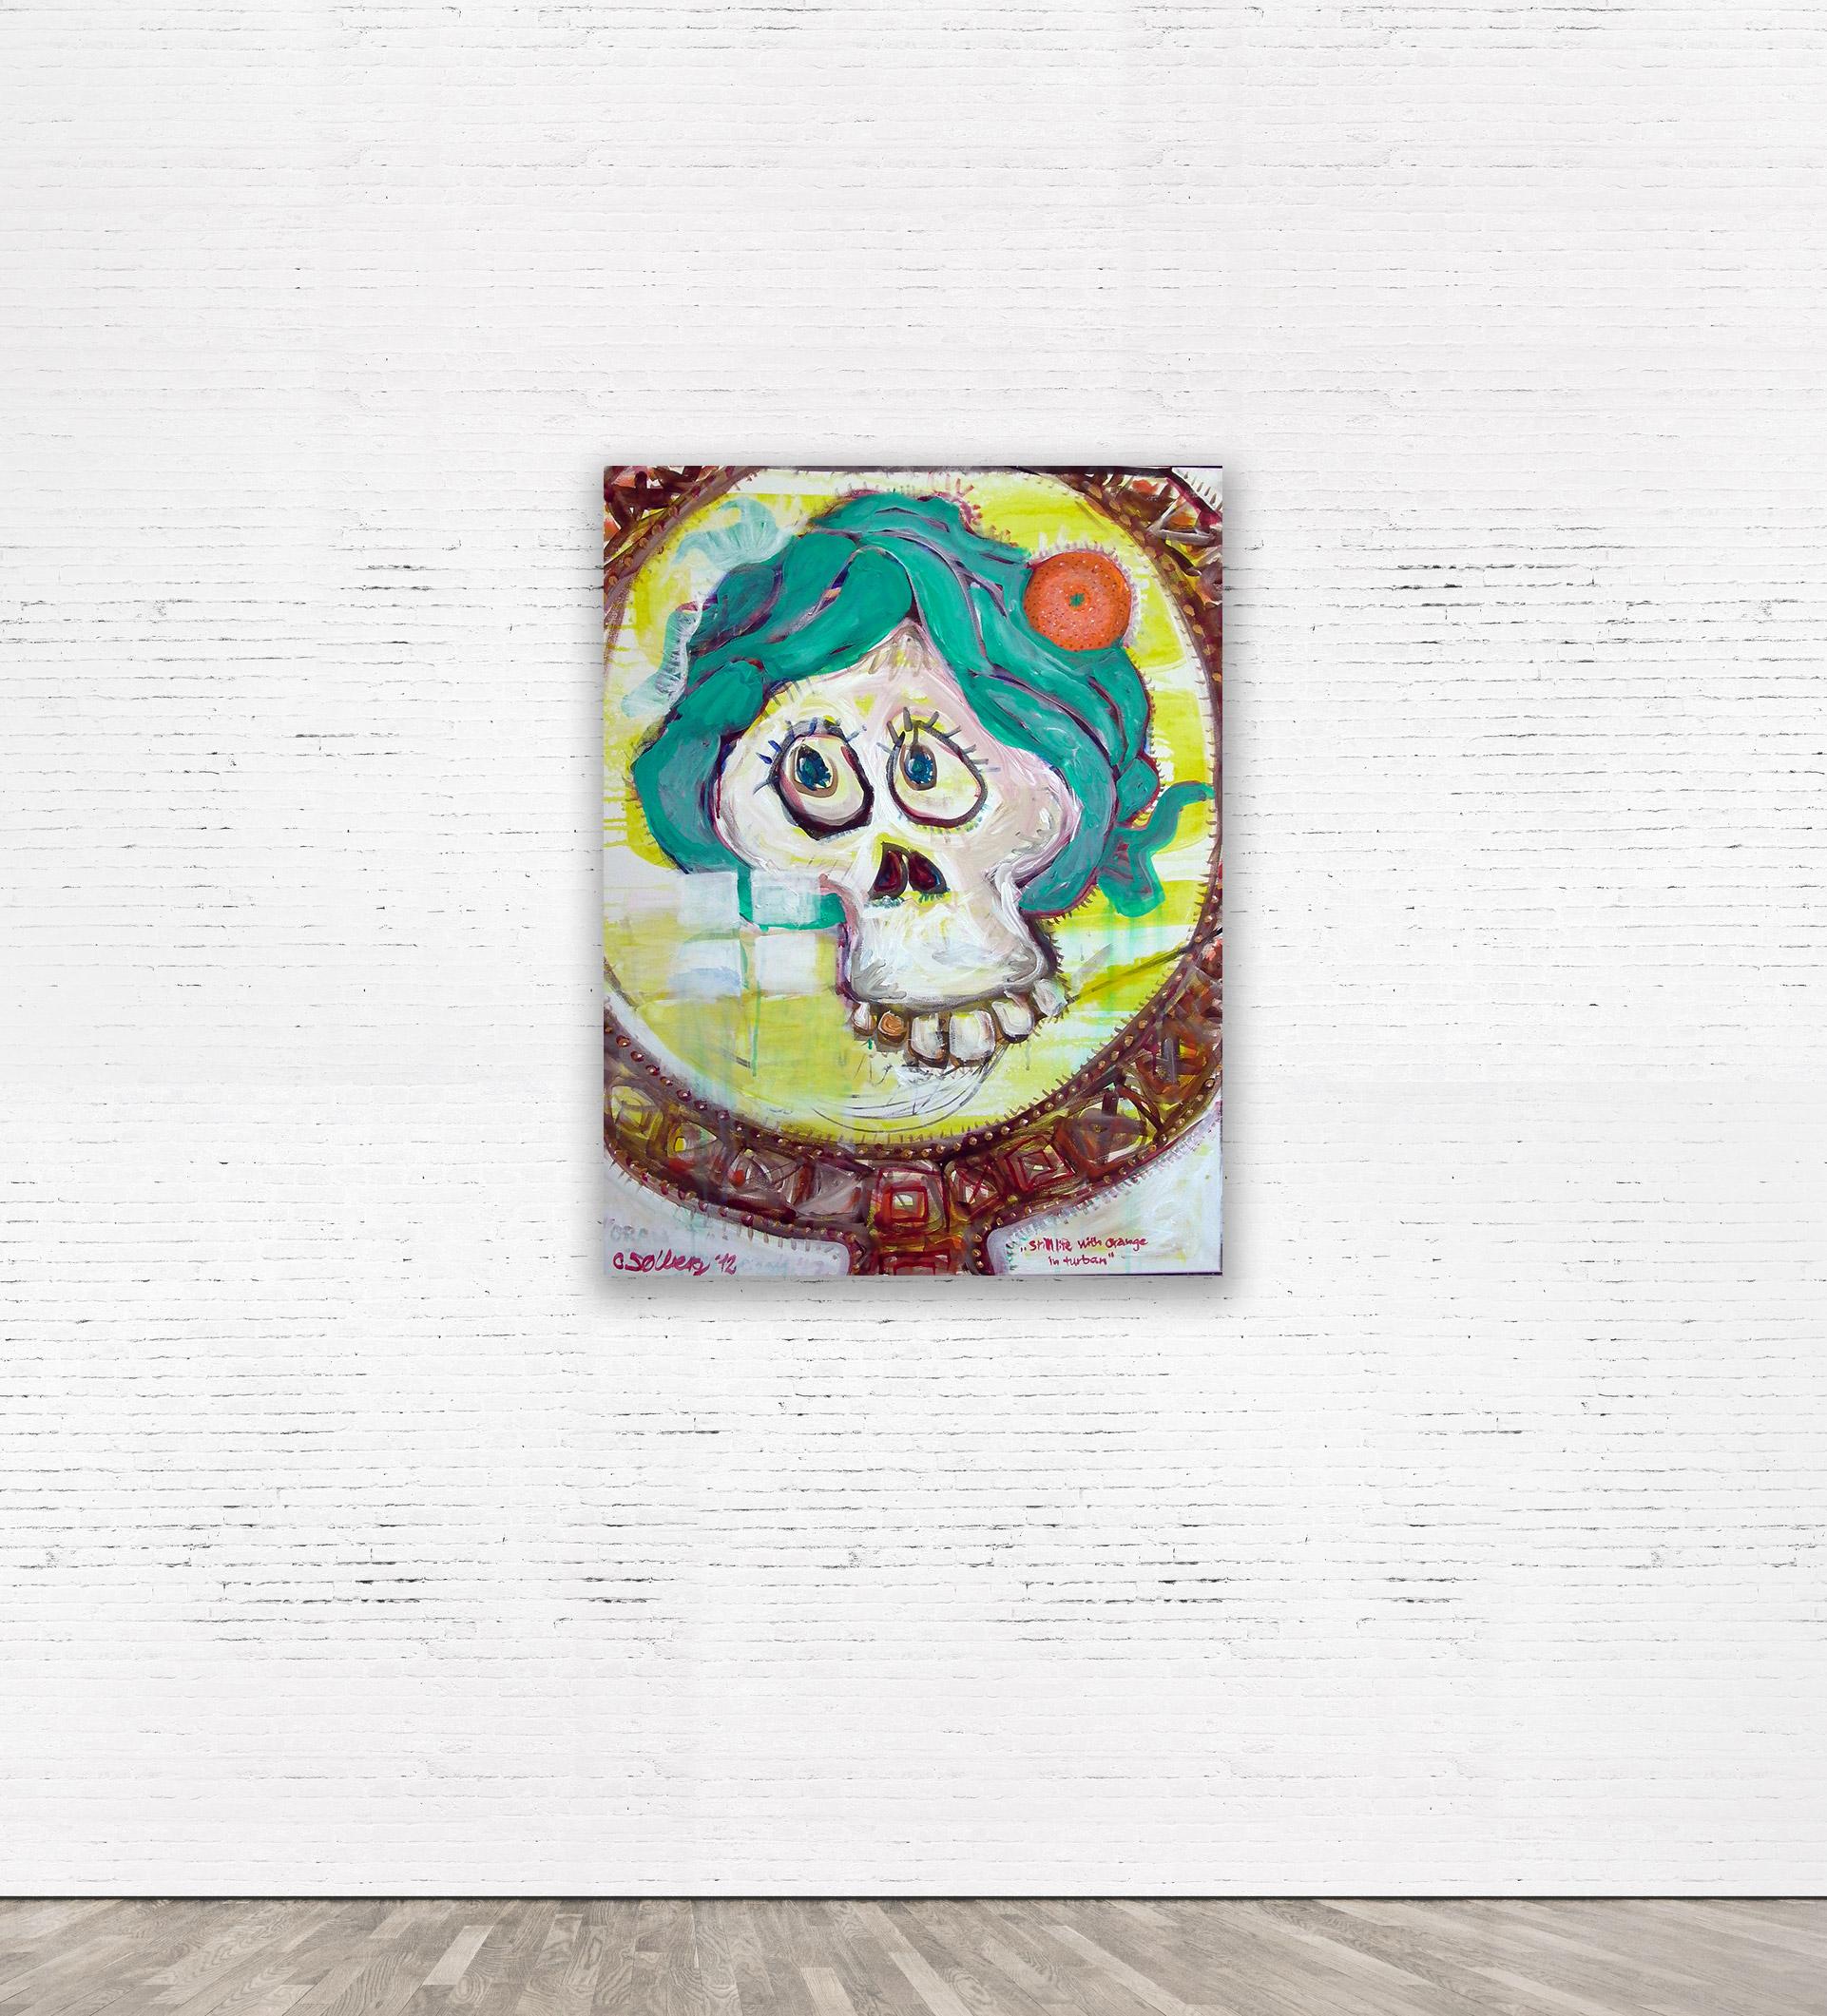 """STILL LIFE WITH ORANGE IN TURBAN""  60 x 80 cm Acrylic on canvas 2012"